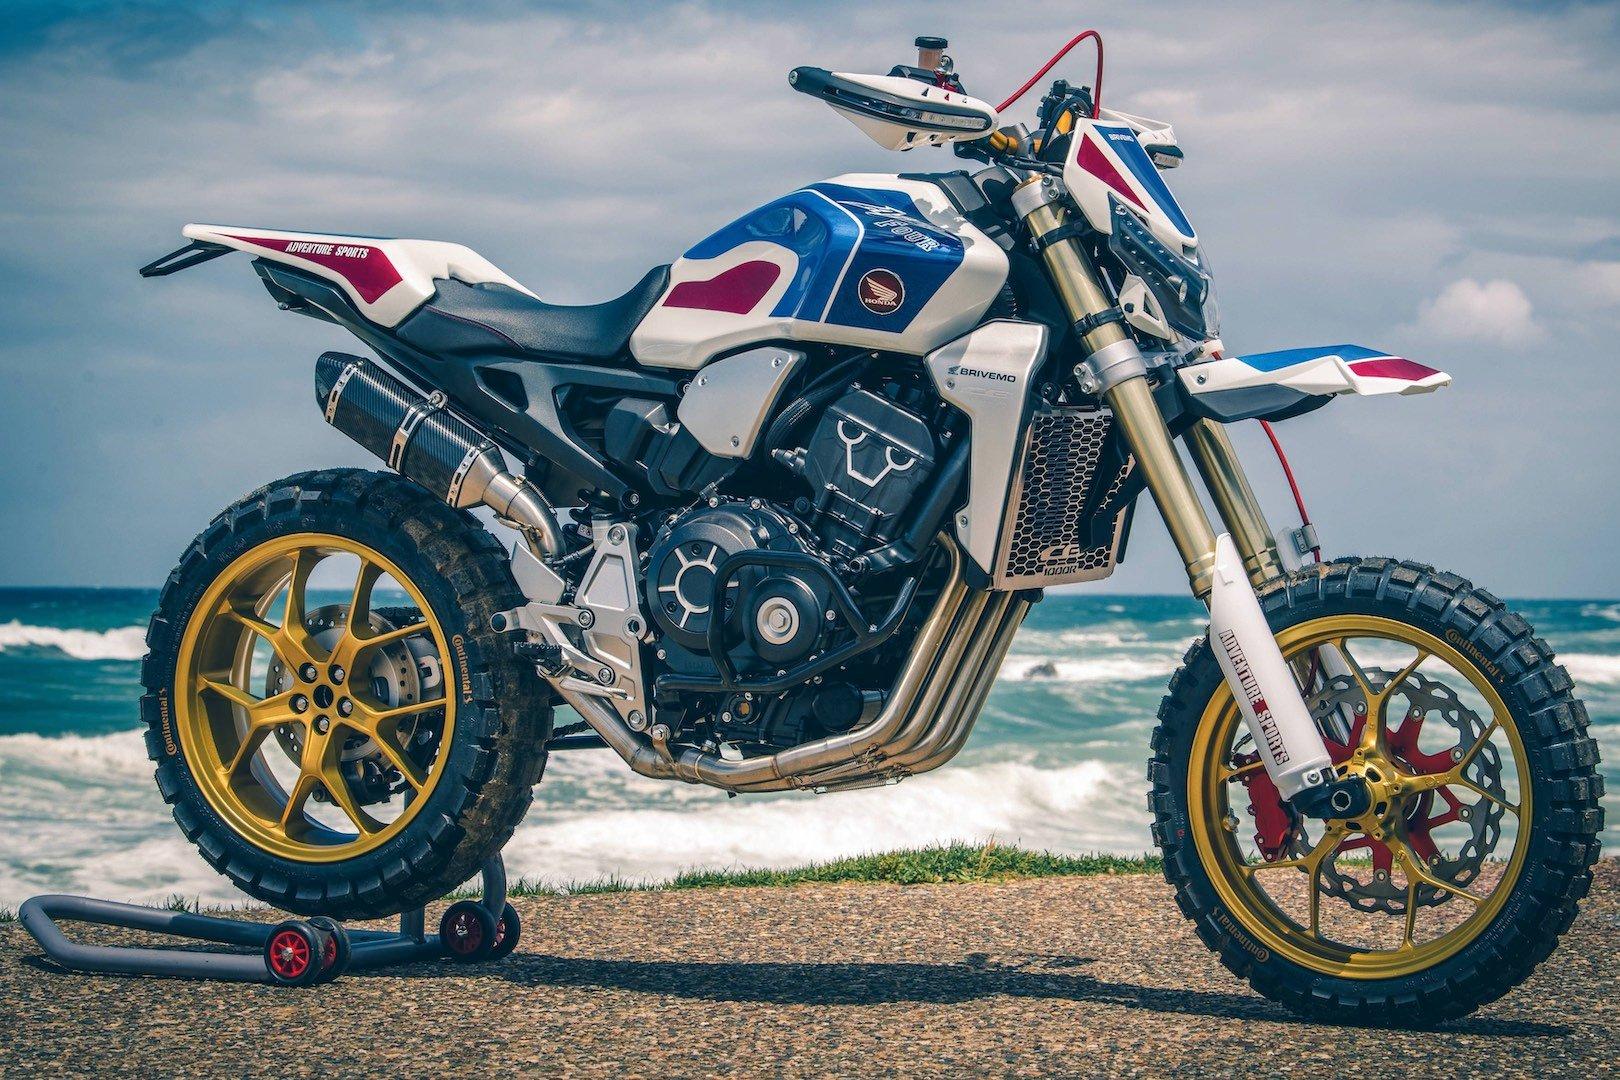 c1c0c43eaa3 2 Custom Honda CB1000R Motorcycles - Brivermo Motors